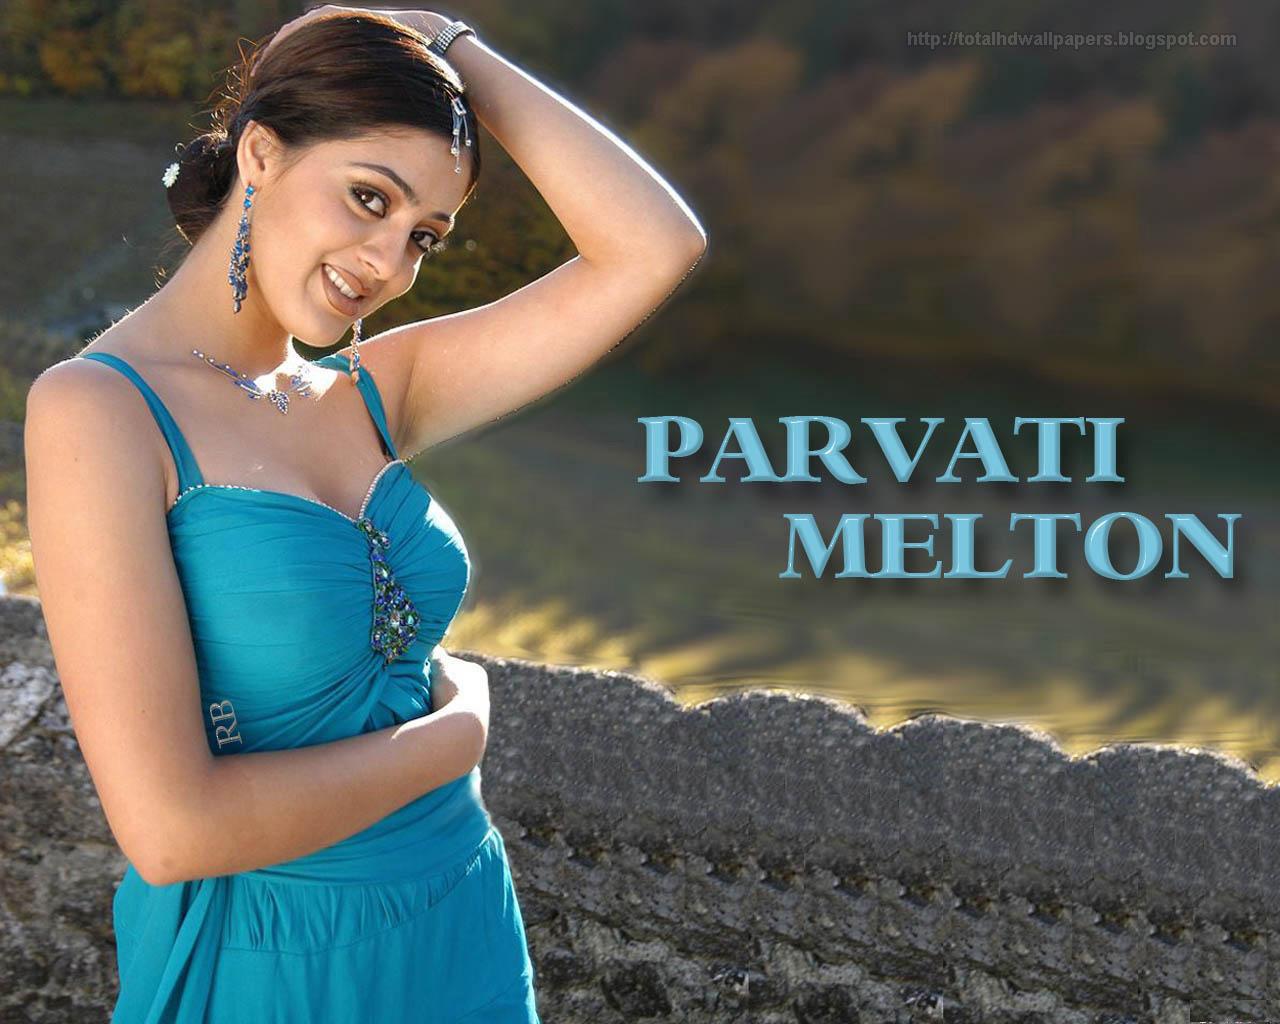 Parvati Melton HD Quality HD Wallpapers Mi9 - parvati melton hd quality wallpapers